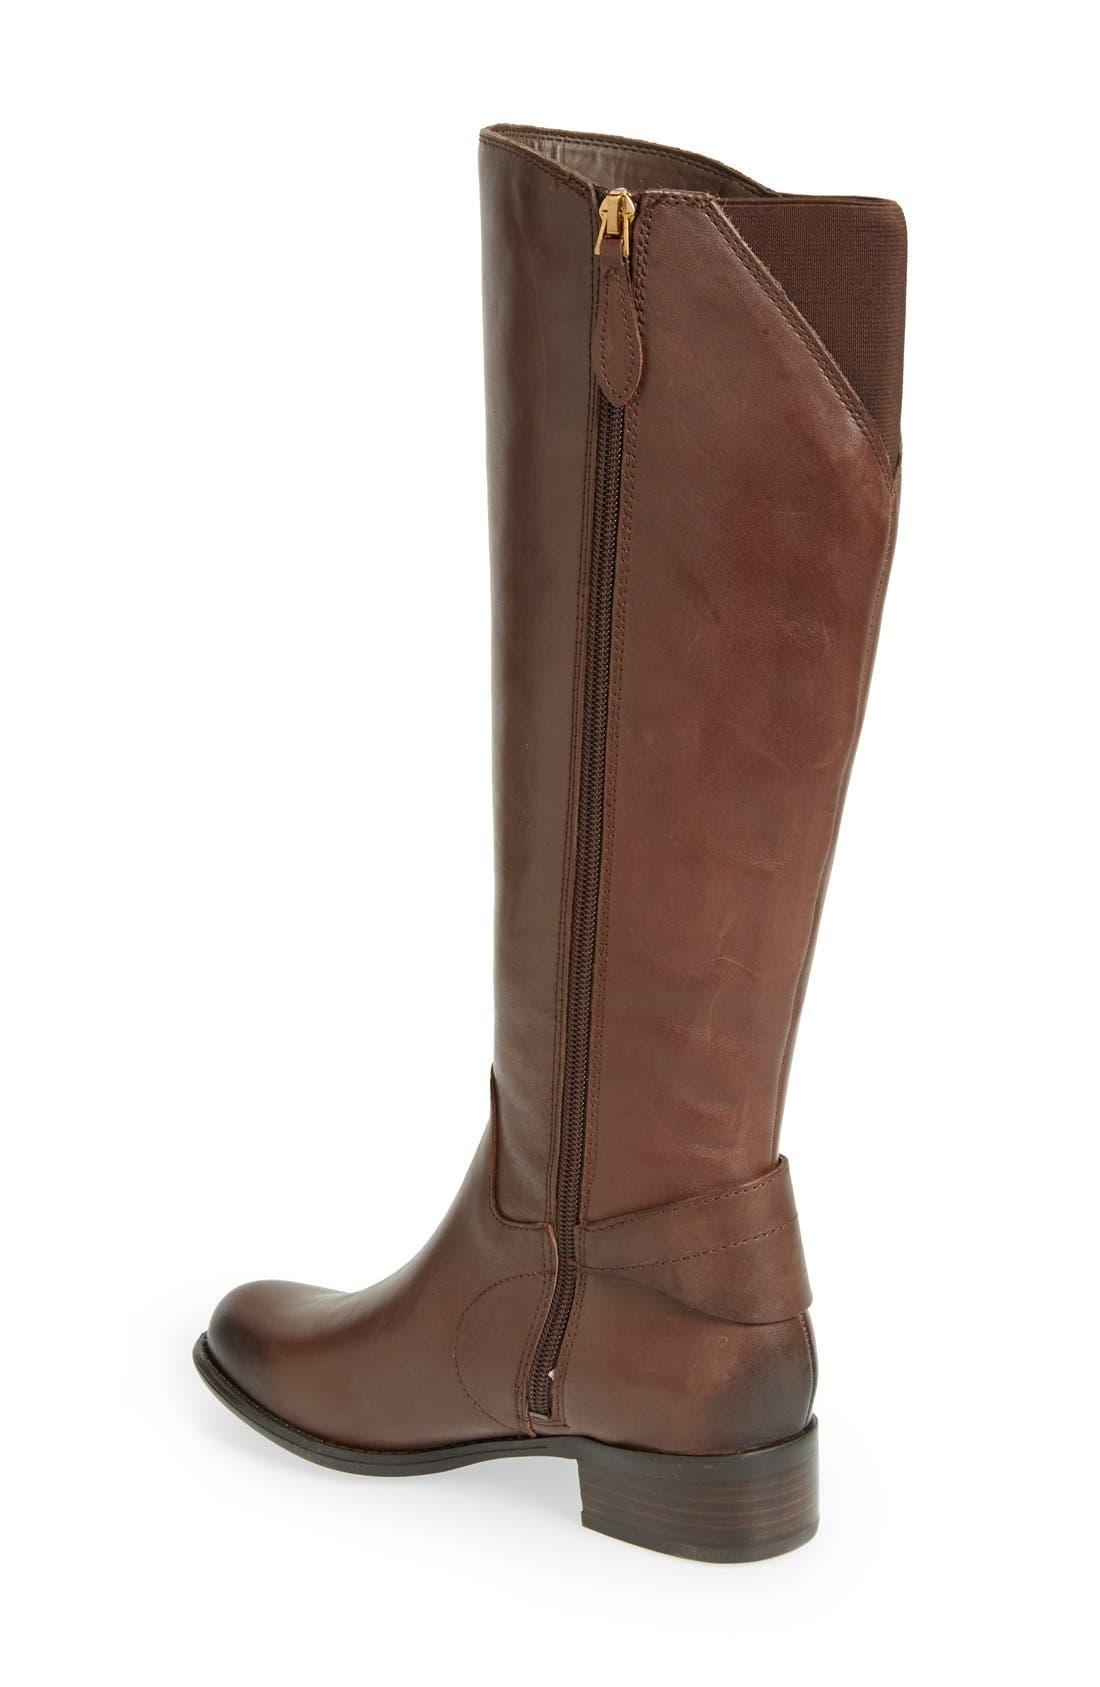 Alternate Image 2  - Franco Sarto 'Craze' Knee High Leather Boot (Women)